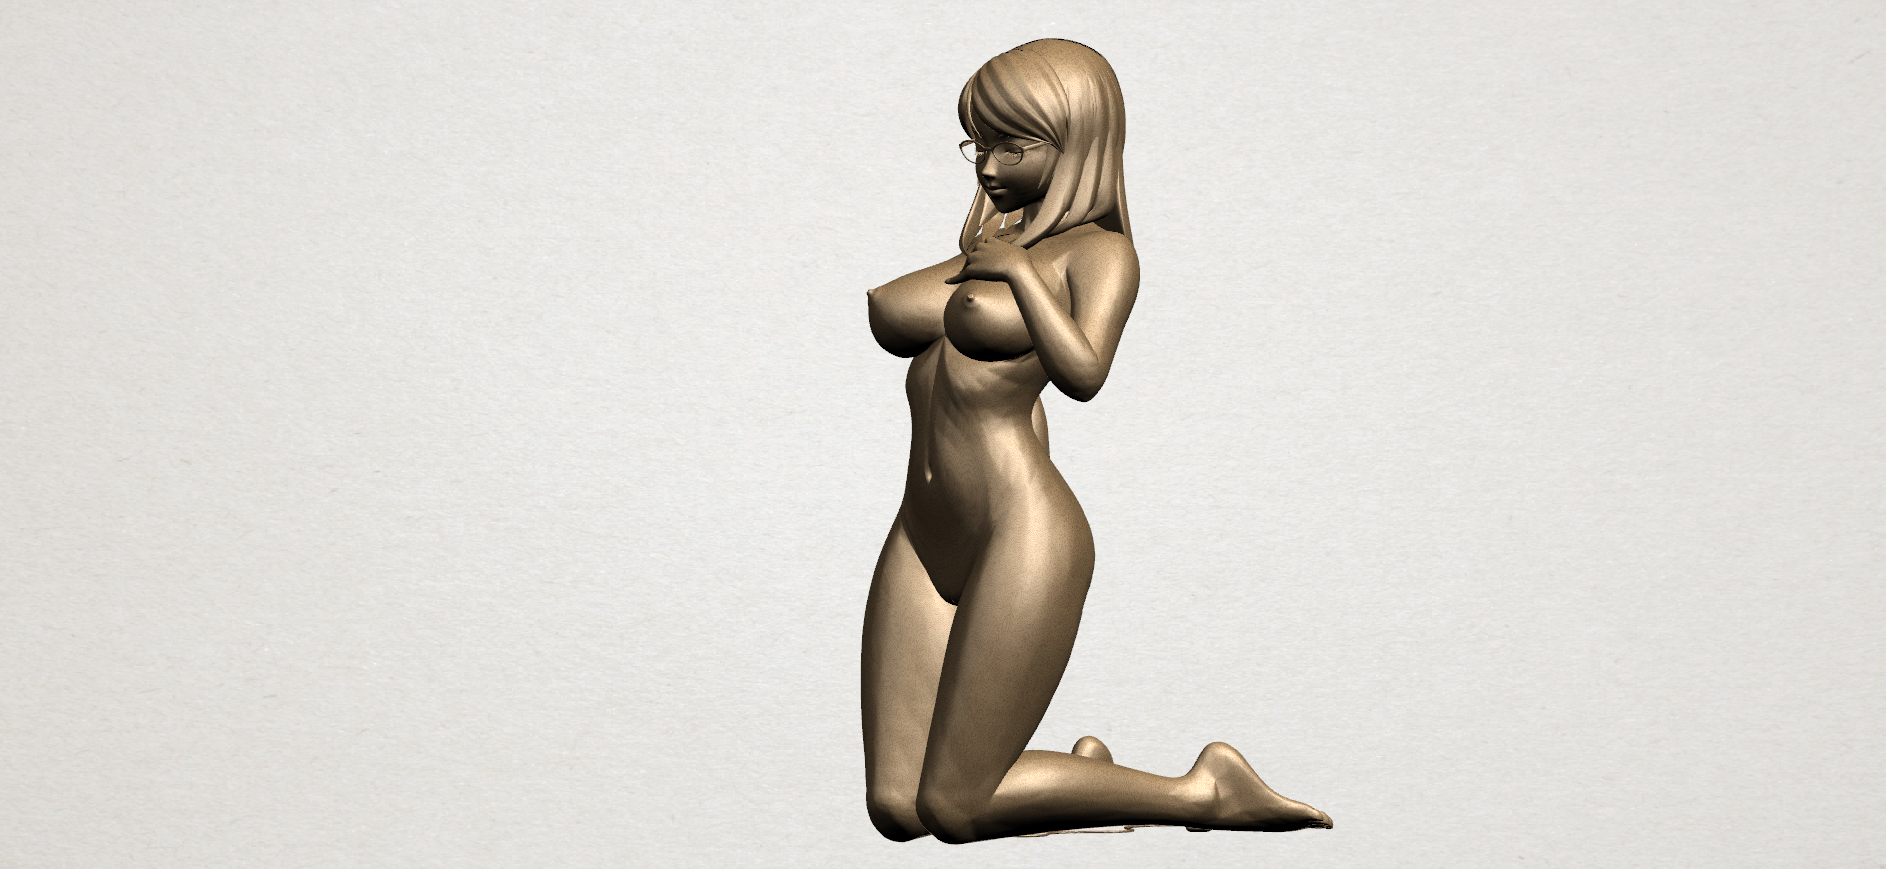 Naked girl - bended knees 01 @ Pinshape